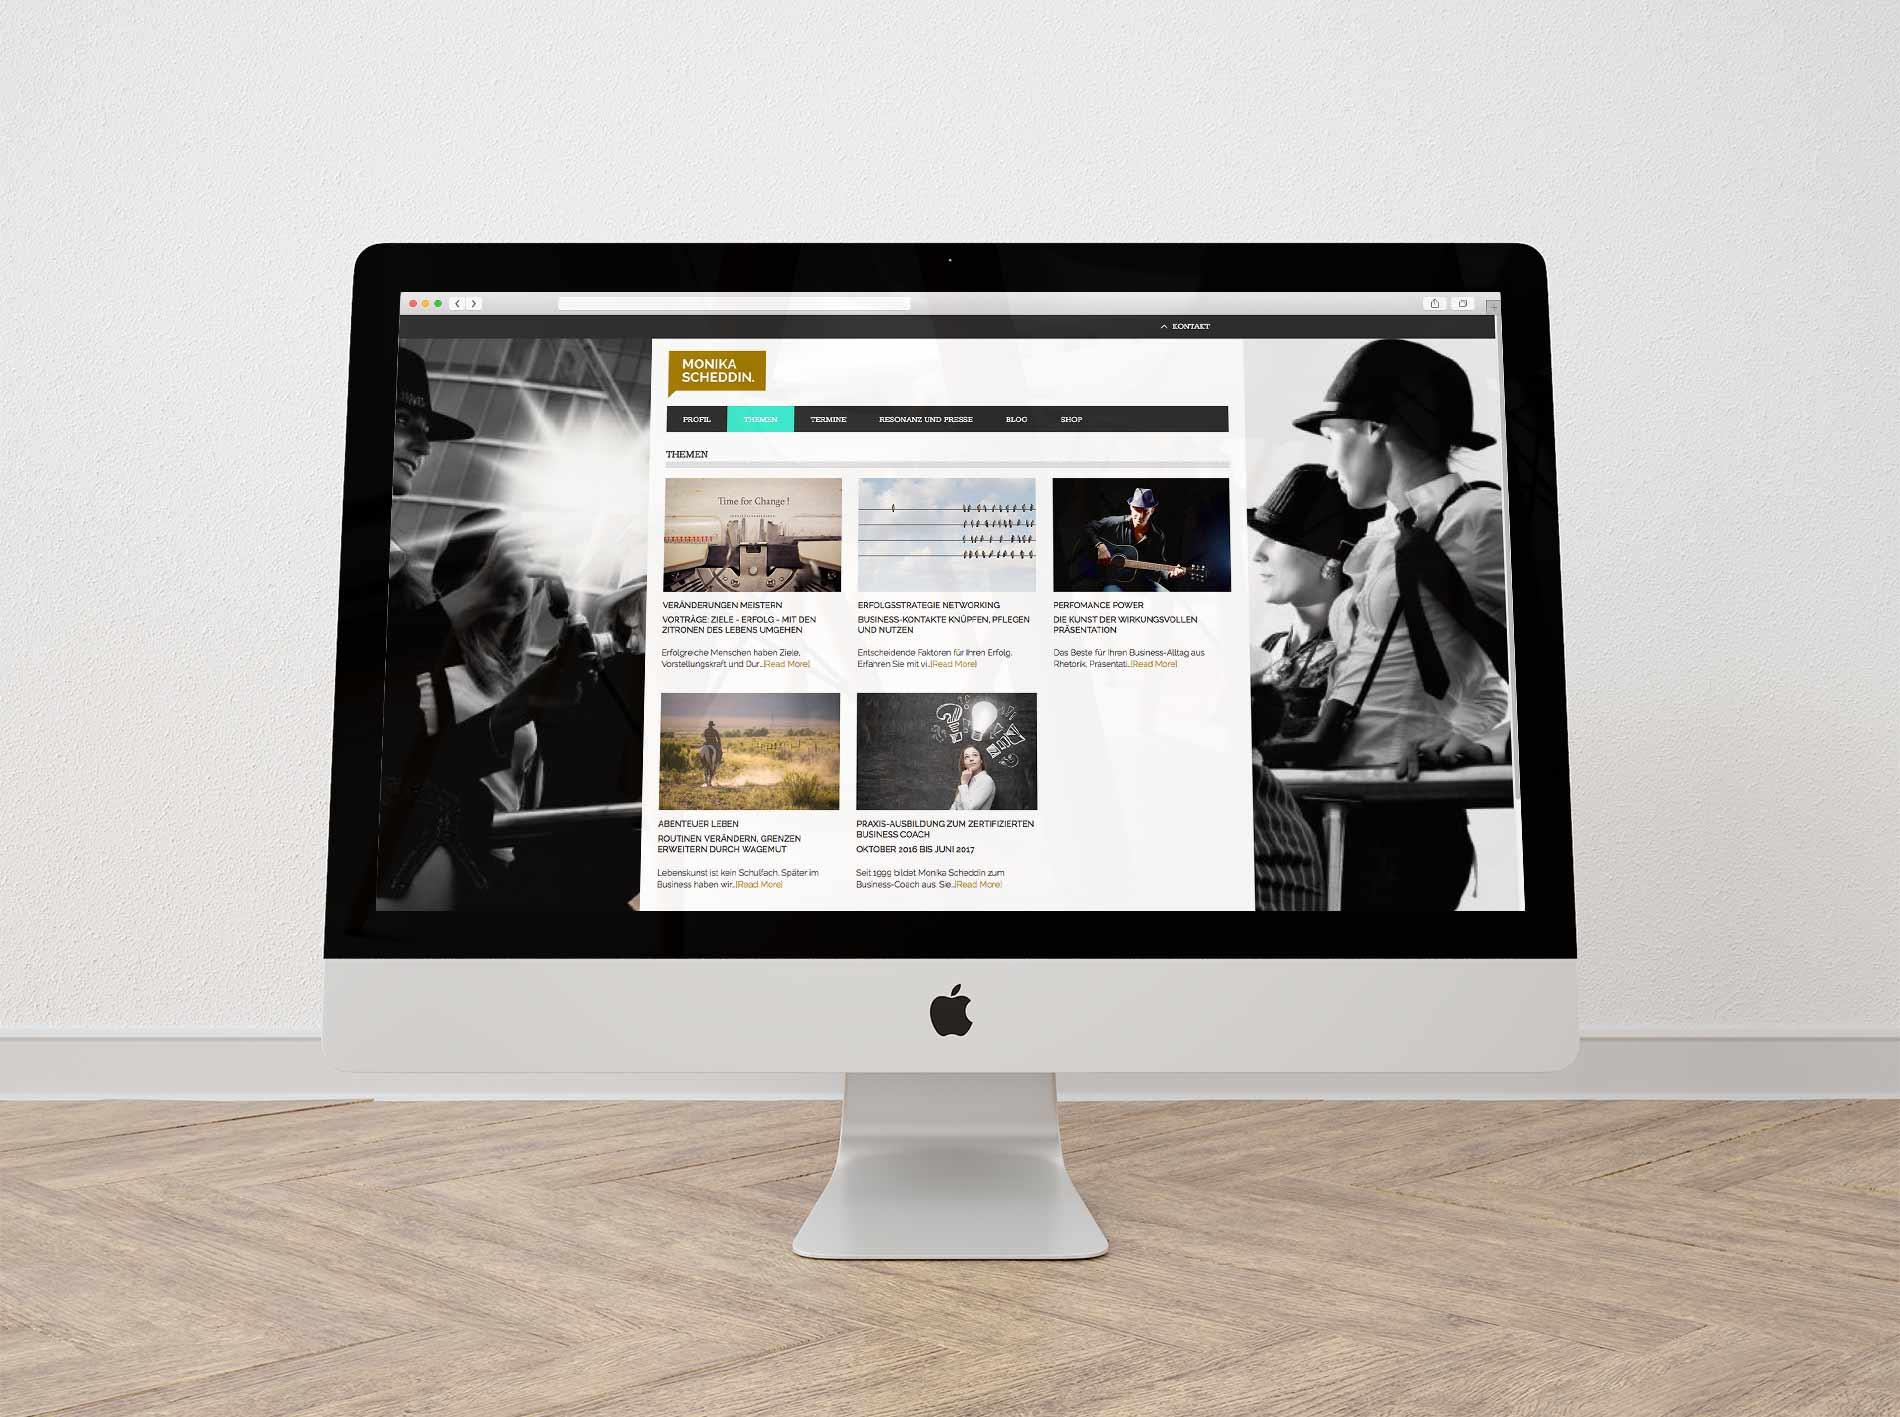 Janina-Lermer-Webseitengestaltung-Webdesign-Themen-Coach-Monika-Scheddin